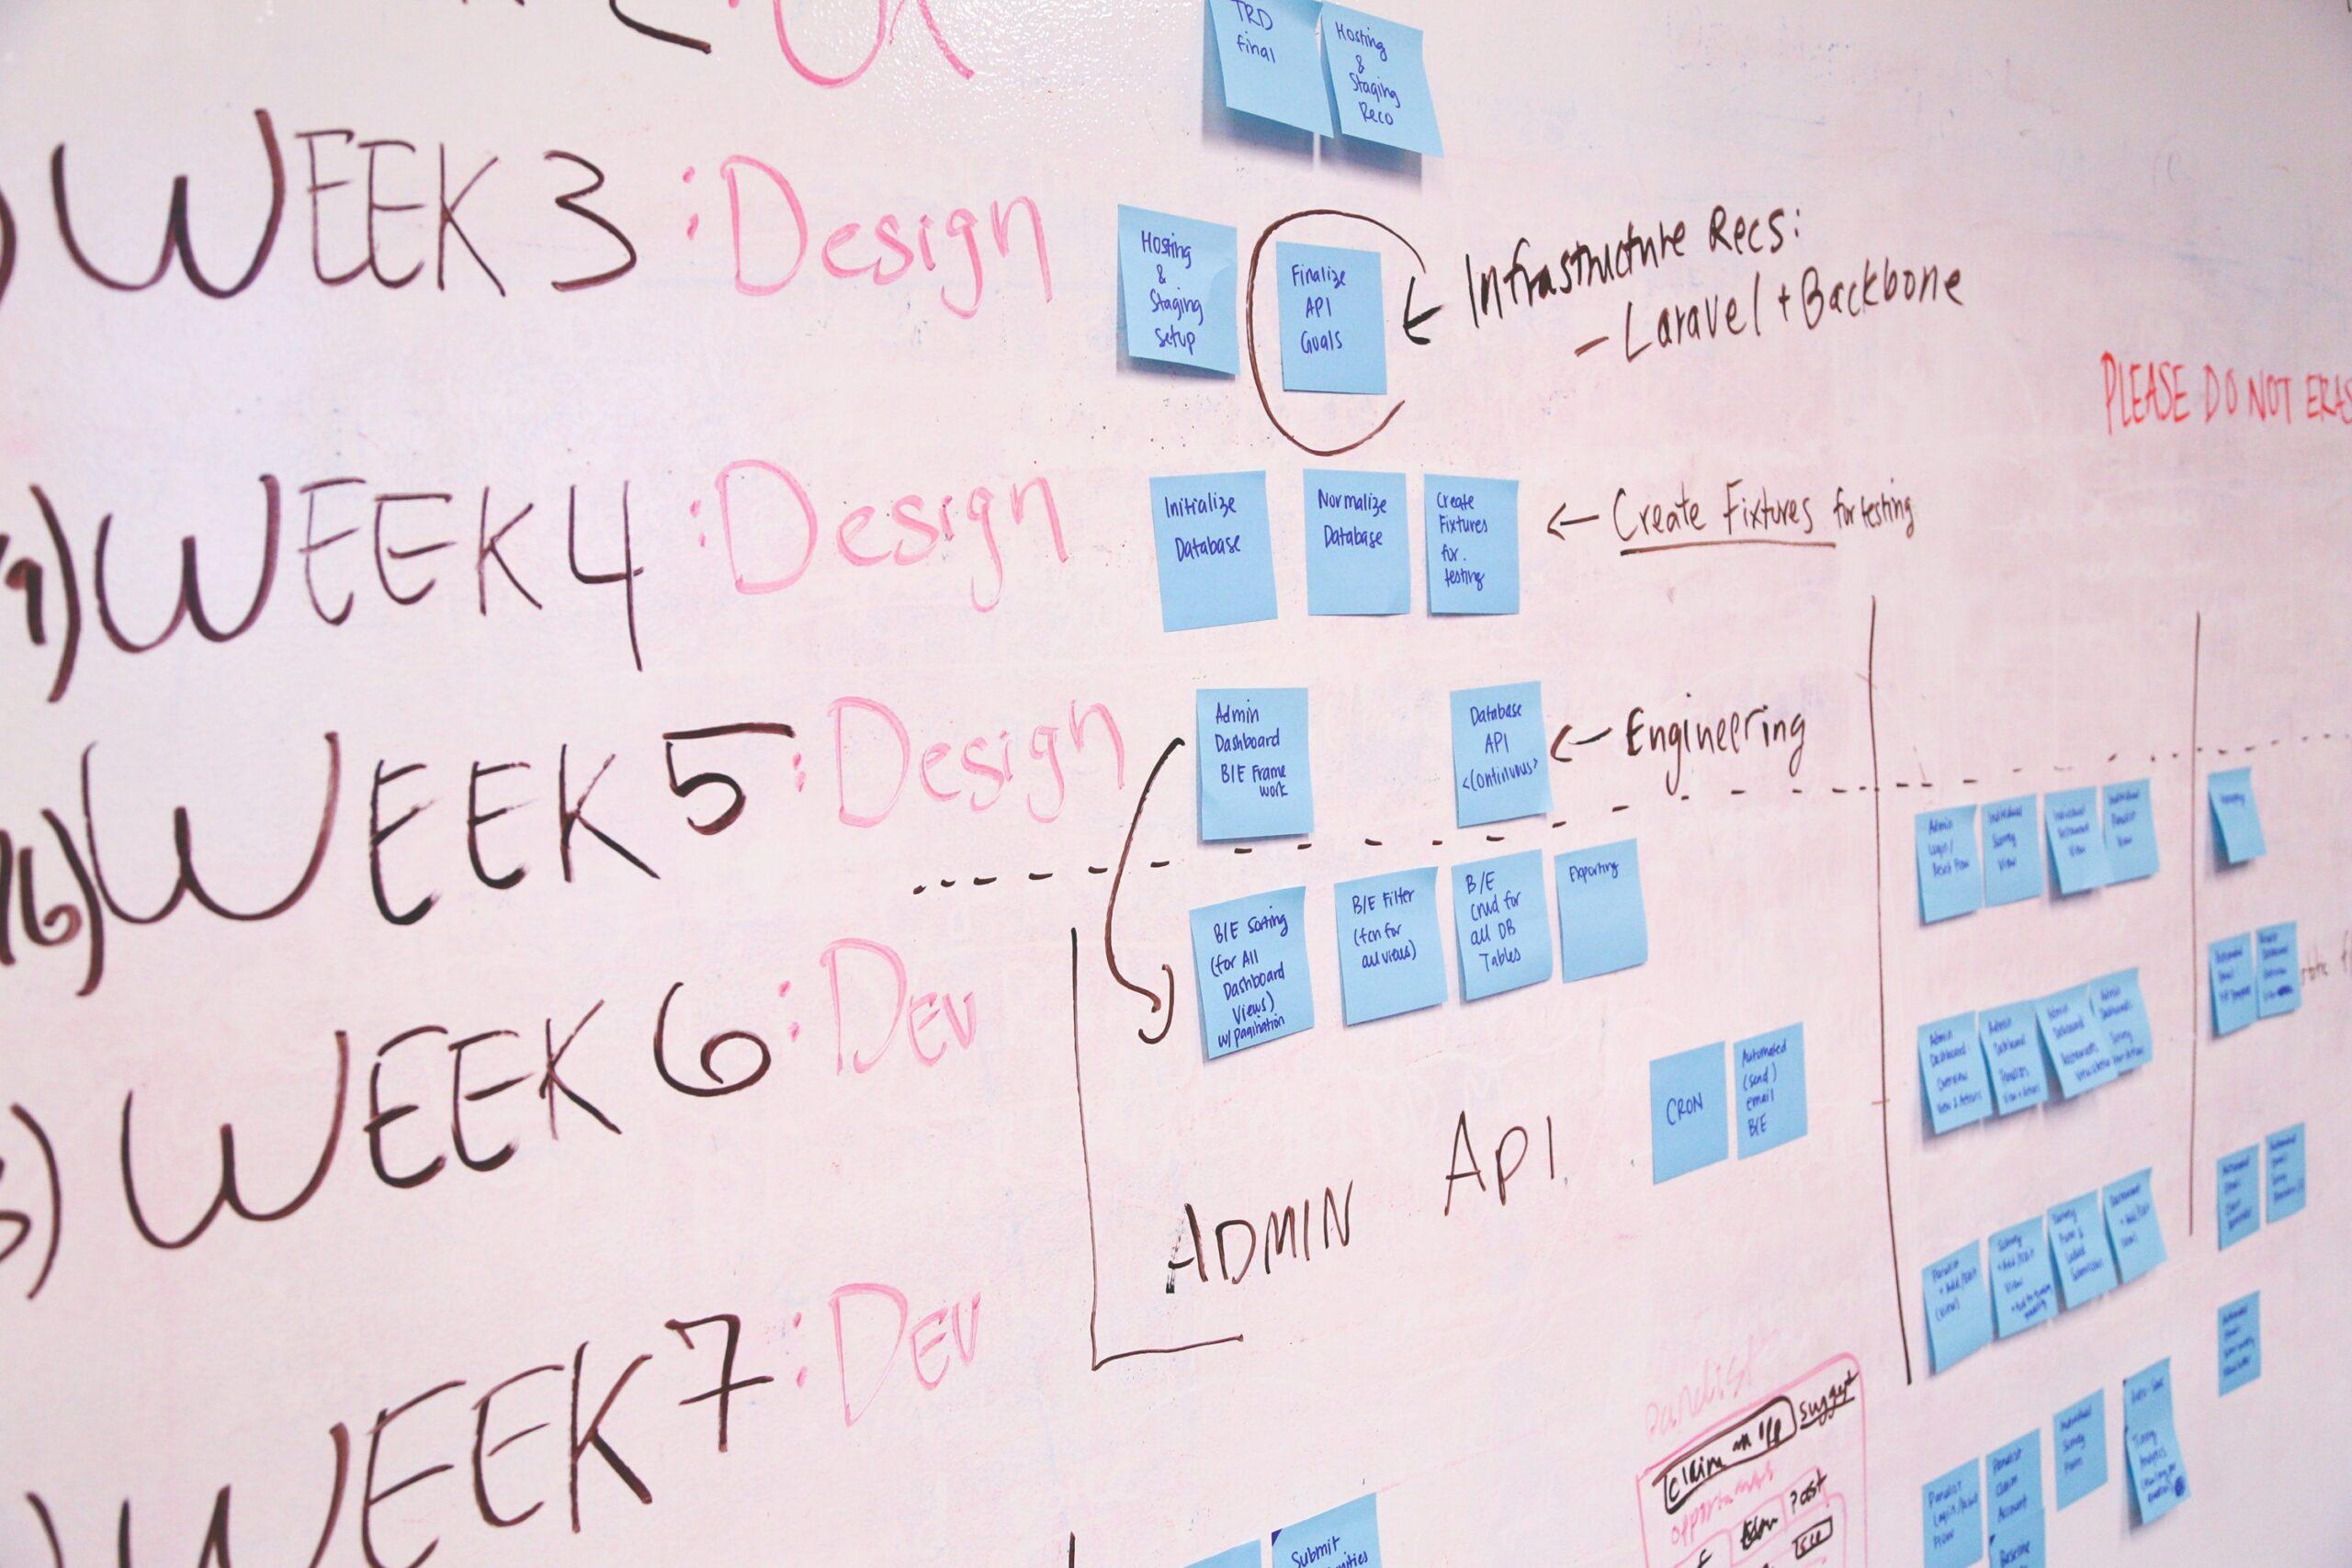 Programmplan eines Projekts